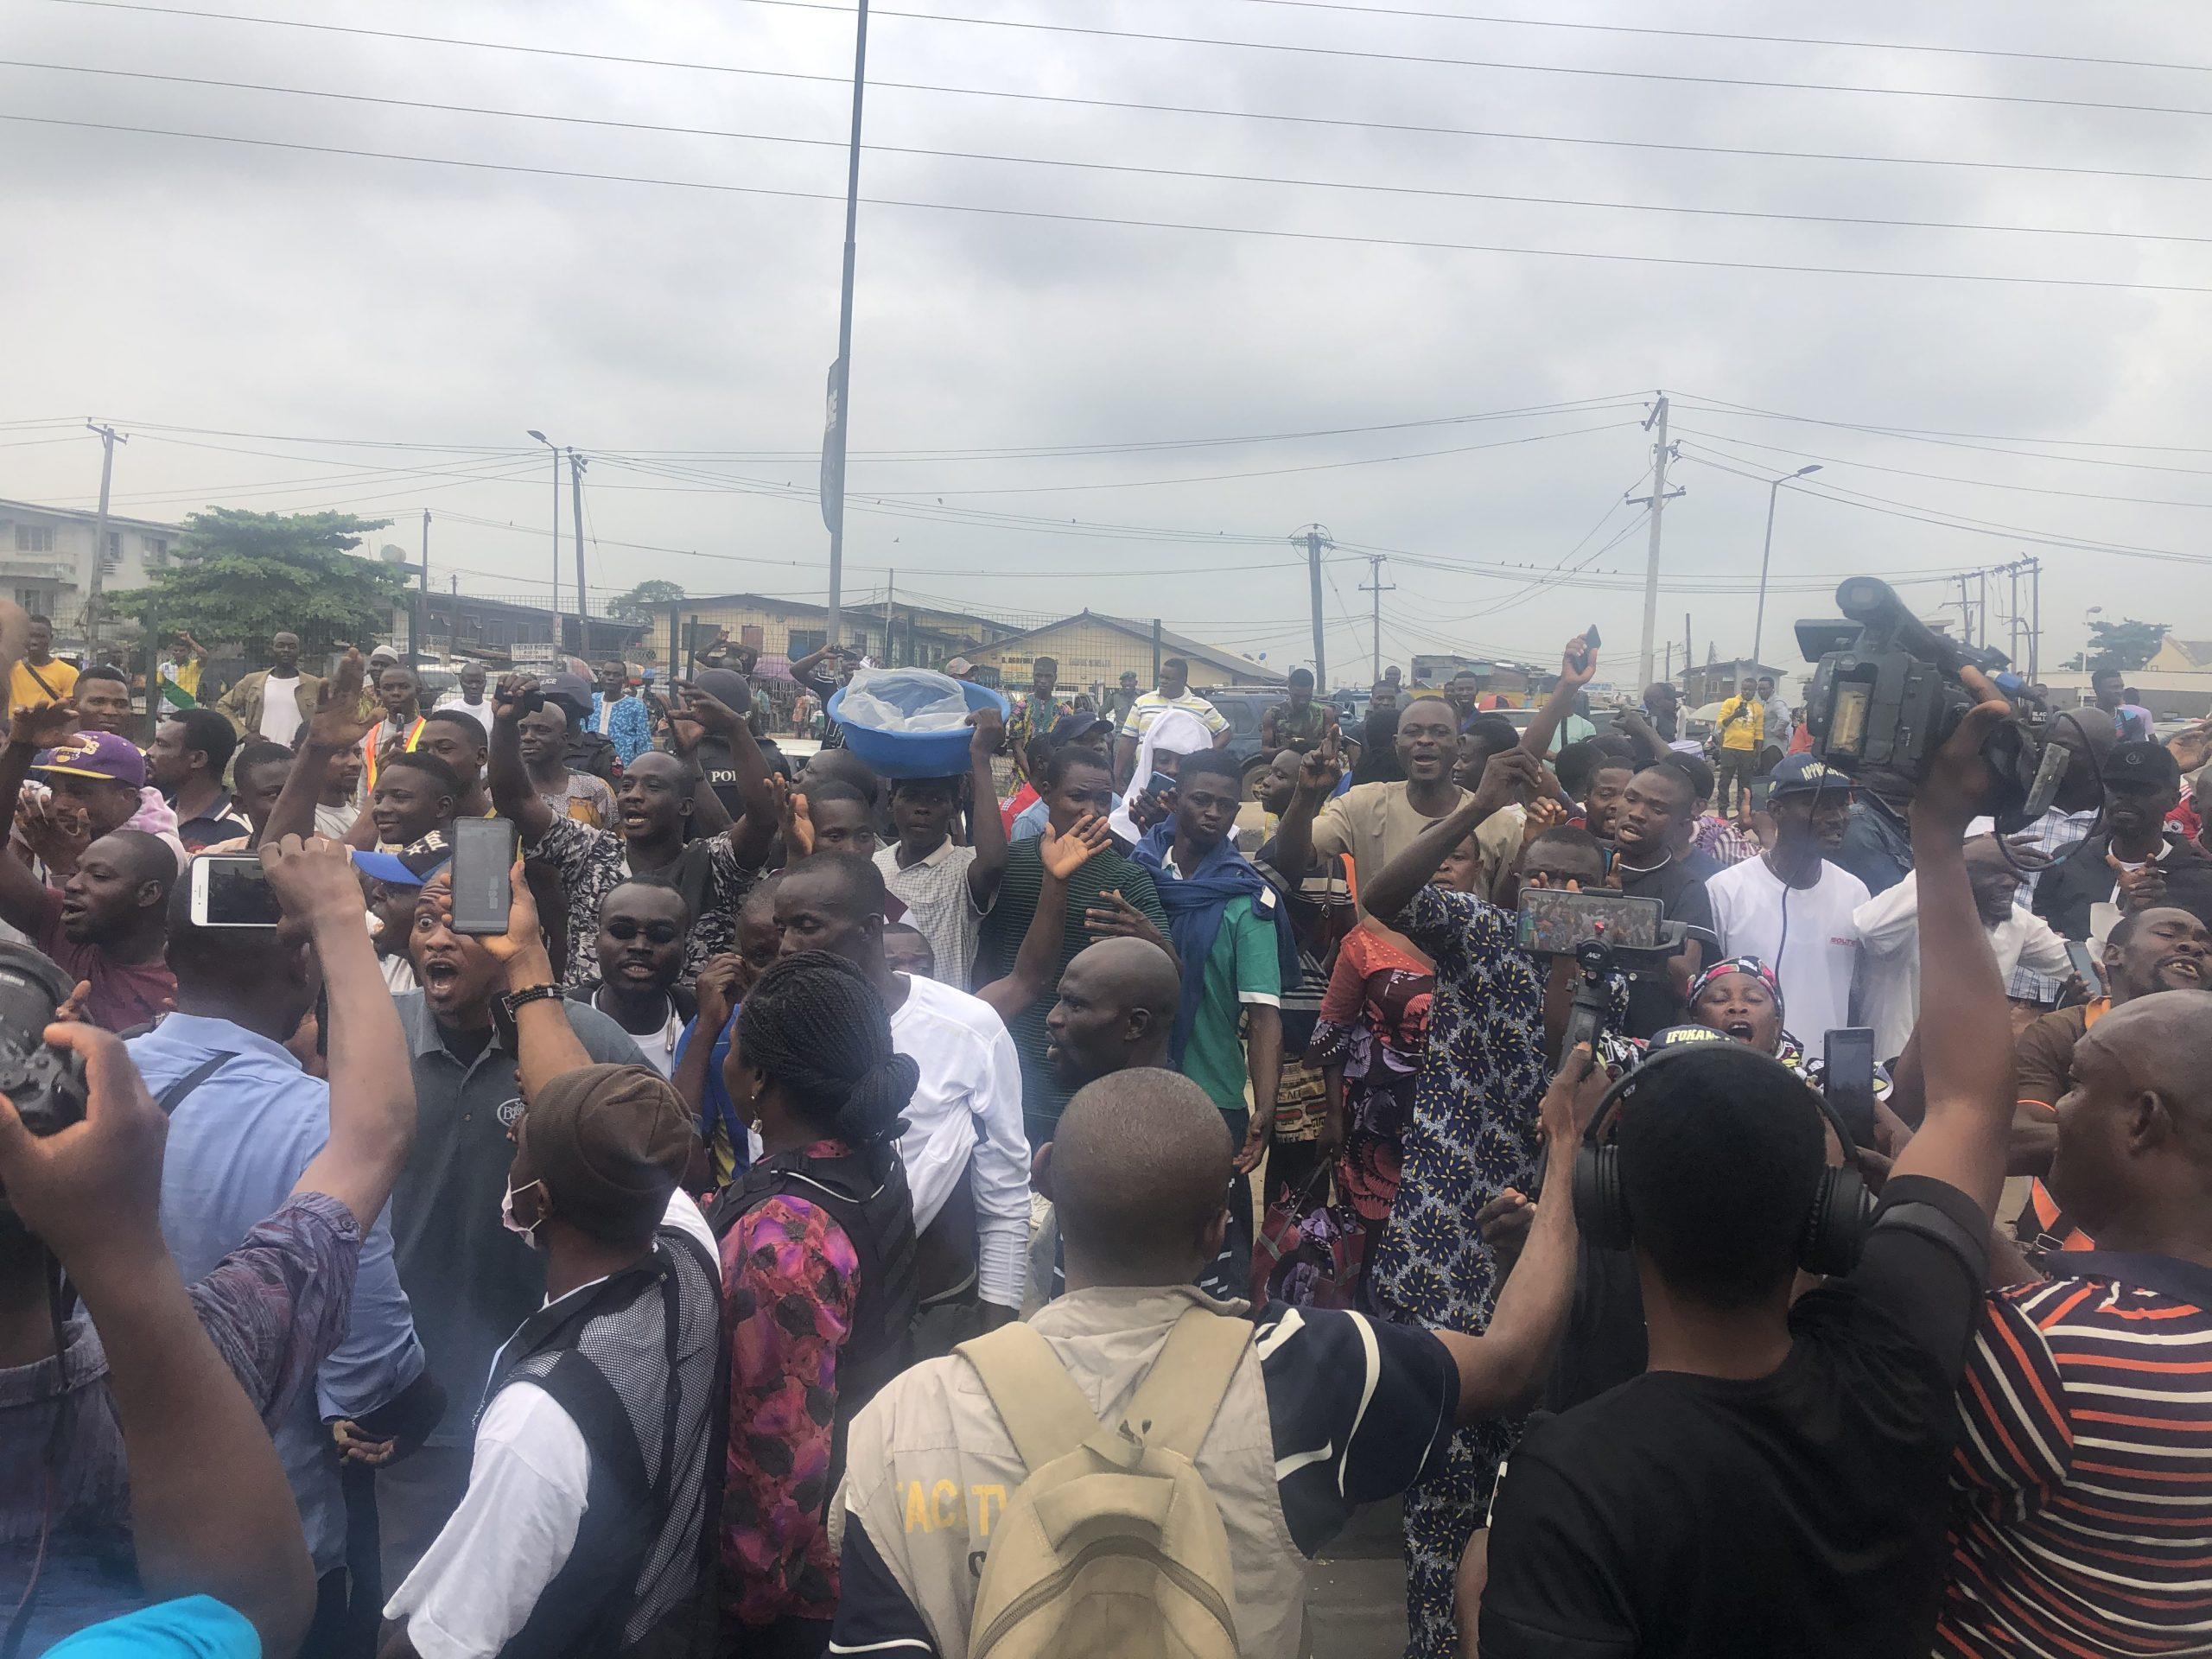 Yoruba nation protesters at Gani Fawehinmi Park, Ojota